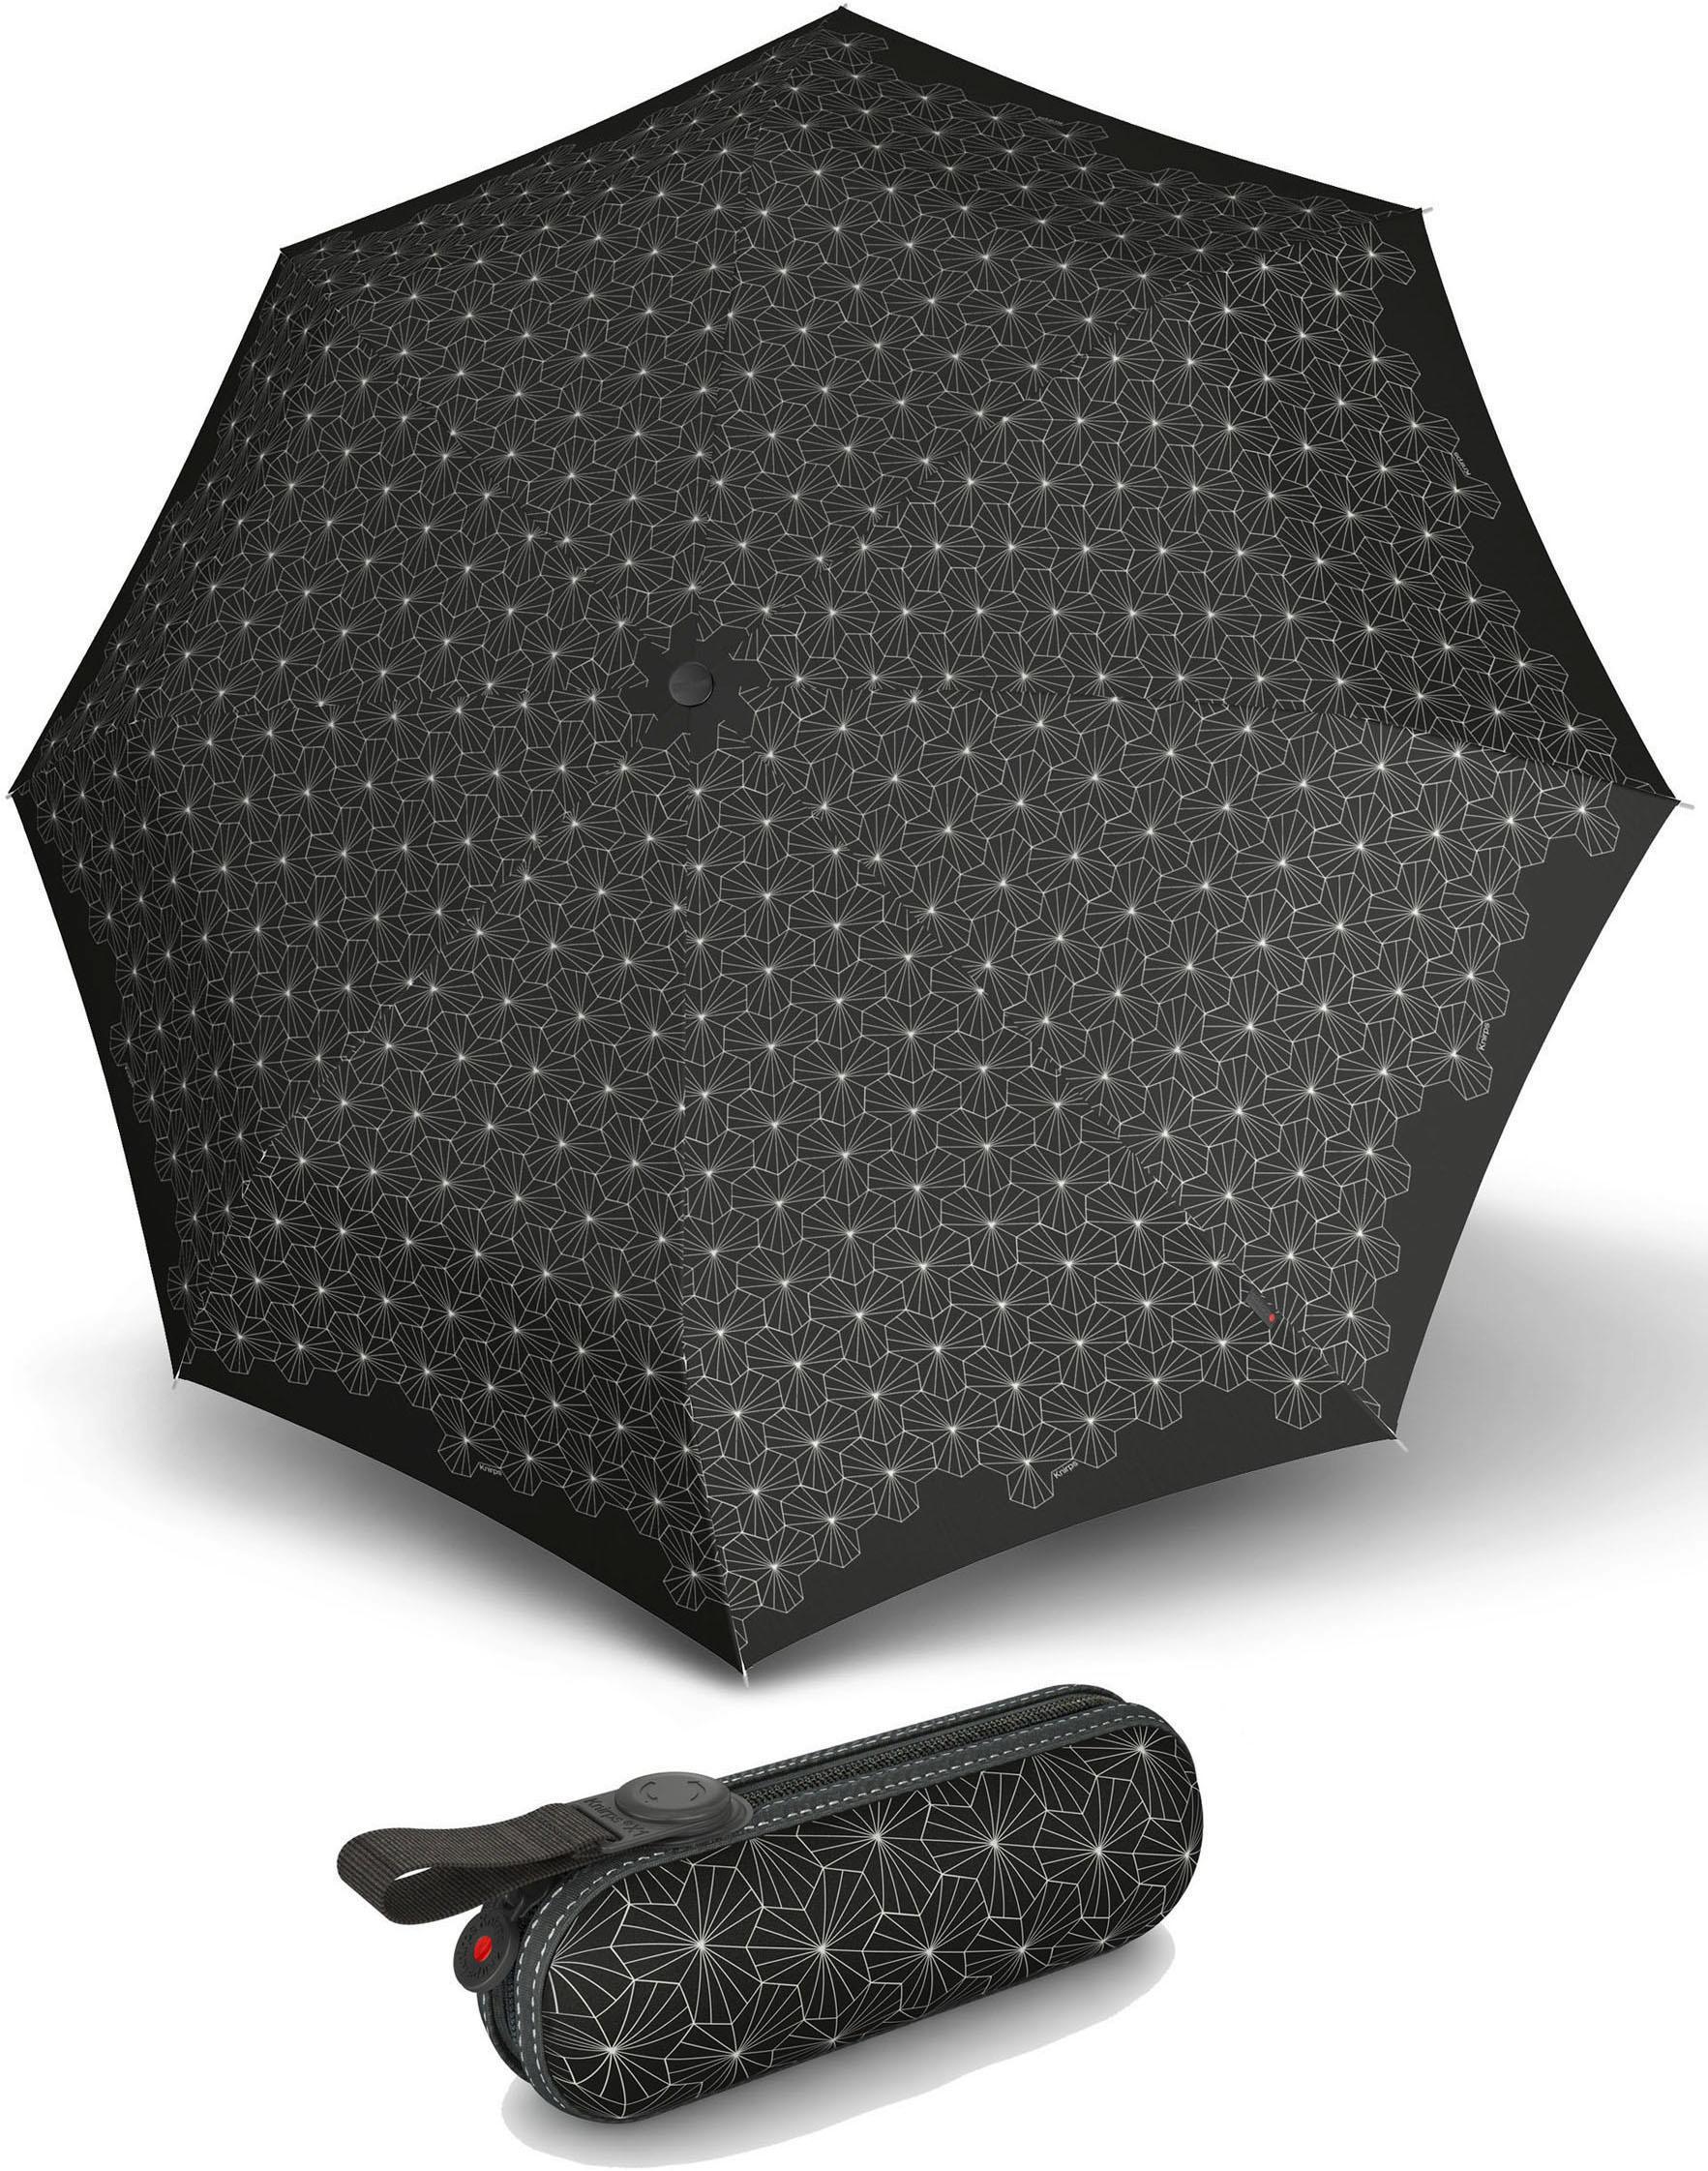 Knirps® Regenschirm - Taschenschirm, »X1 lotus black« | Accessoires > Regenschirme > Taschenschirme | Schwarz | KNIRPS